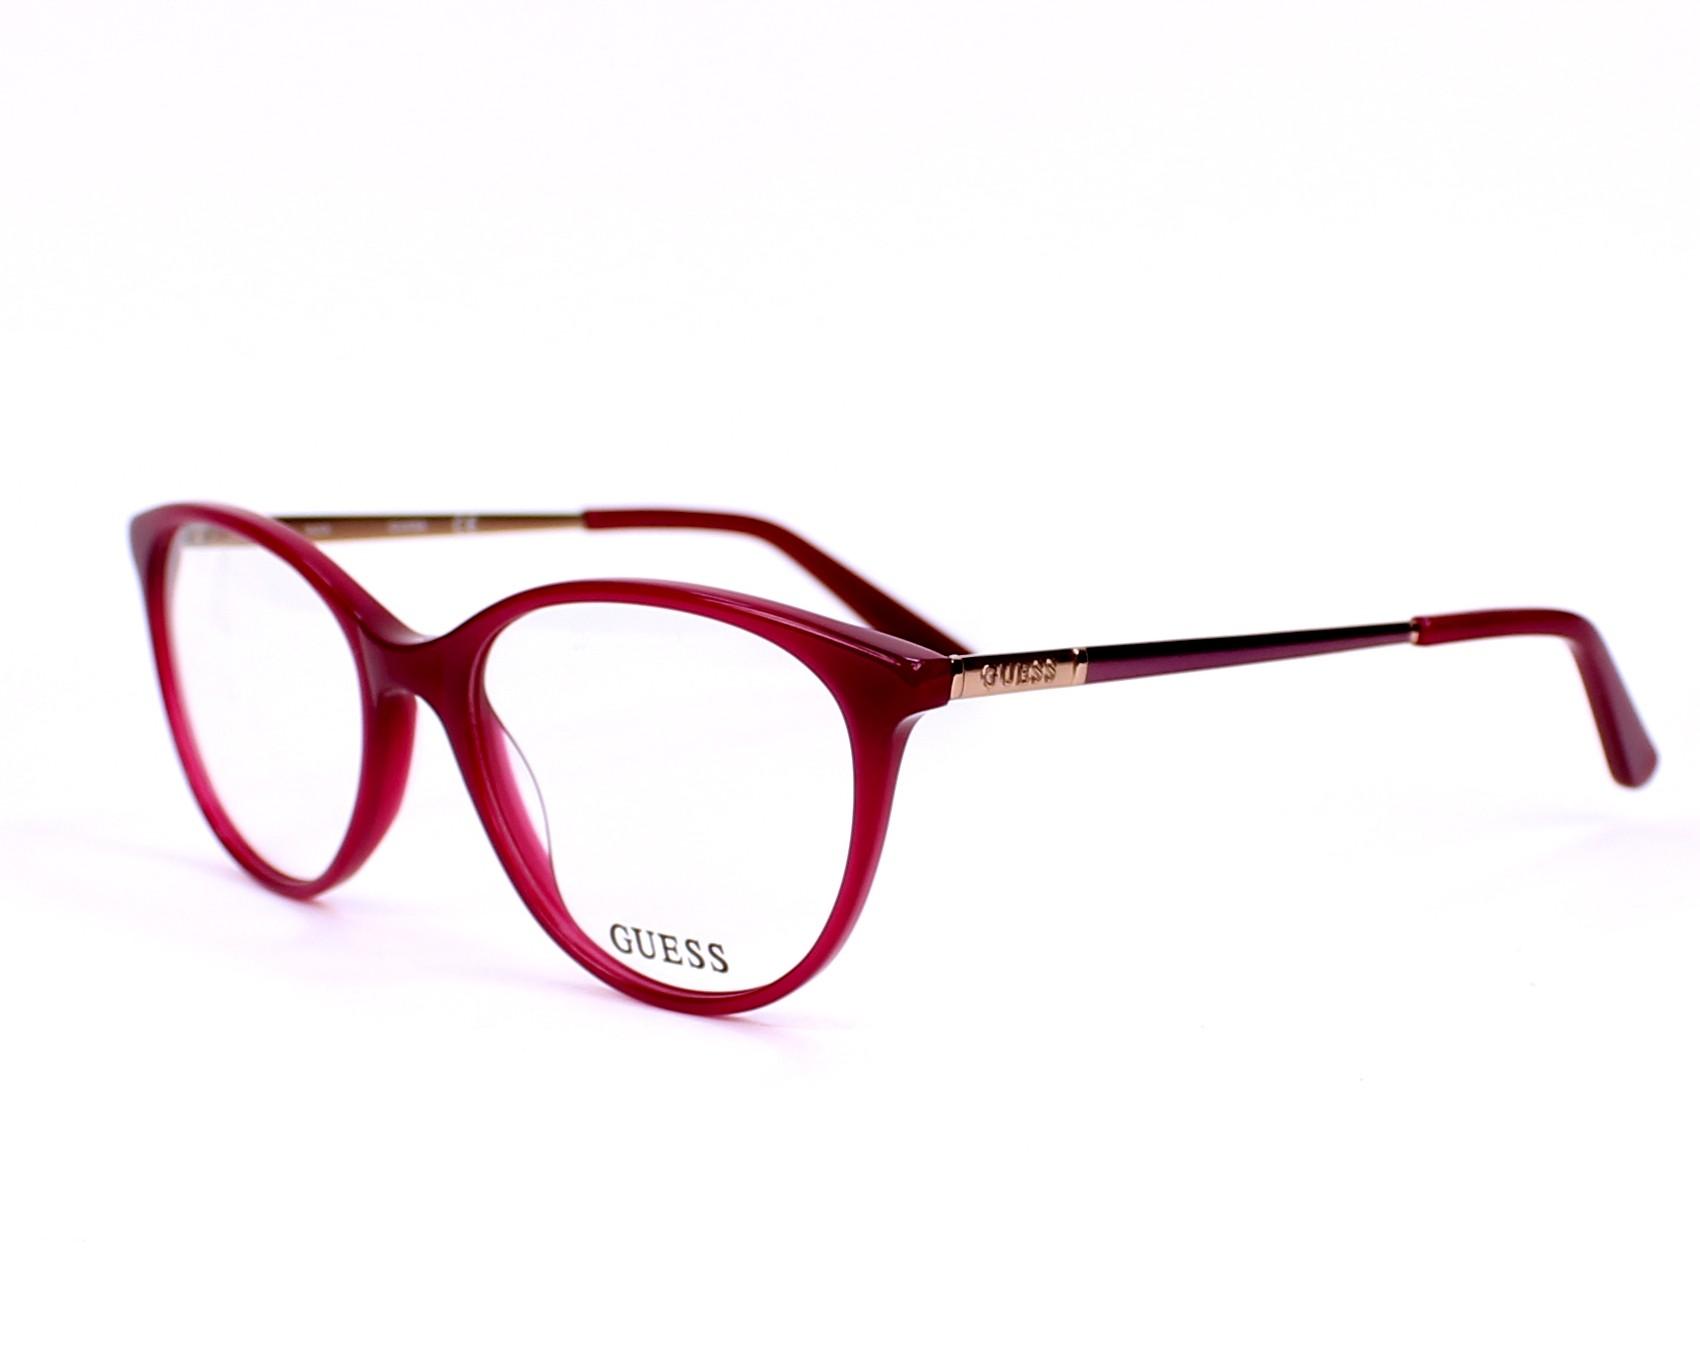 cb33076d5ee eyeglasses Guess GU-2565 075 52-17 Fuchsia Pink profile view